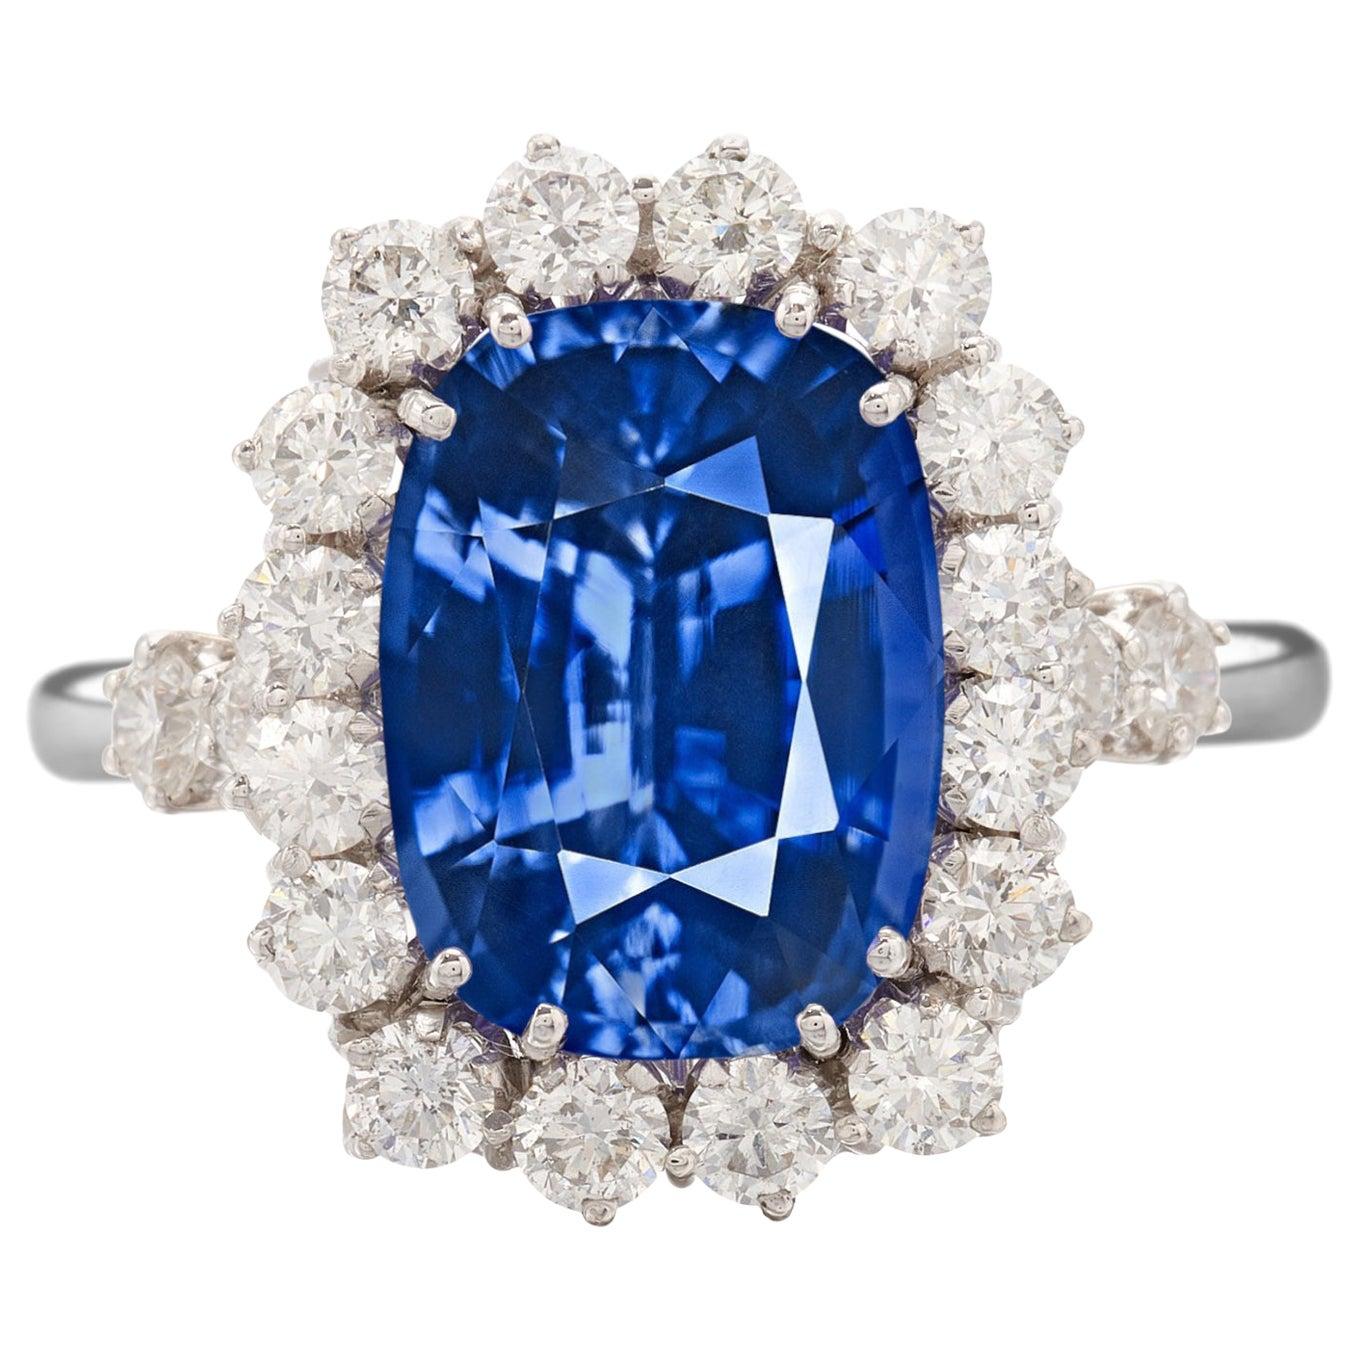 Exceptional GIA IGI Certified 5 Carat Kashmir Blue Cushion Sapphire Diamond Ring